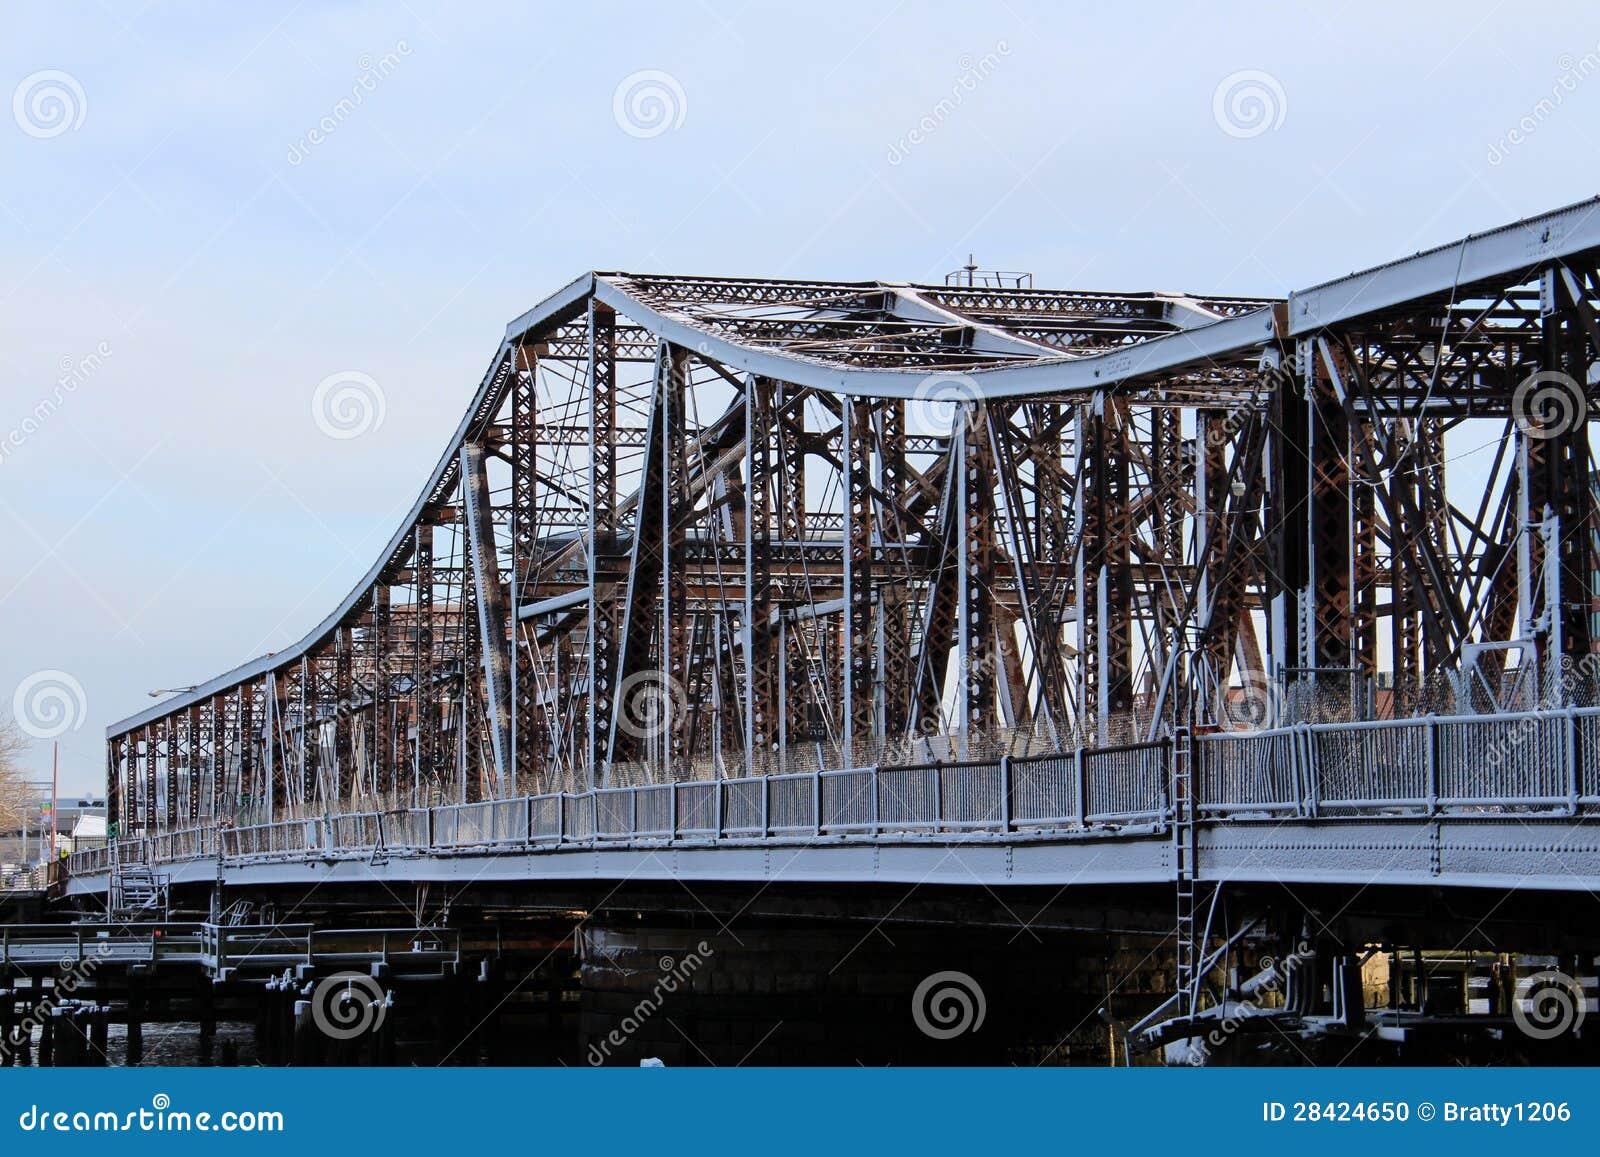 Metal Covered Bridges : Snow covered old metal bridge stock photo image